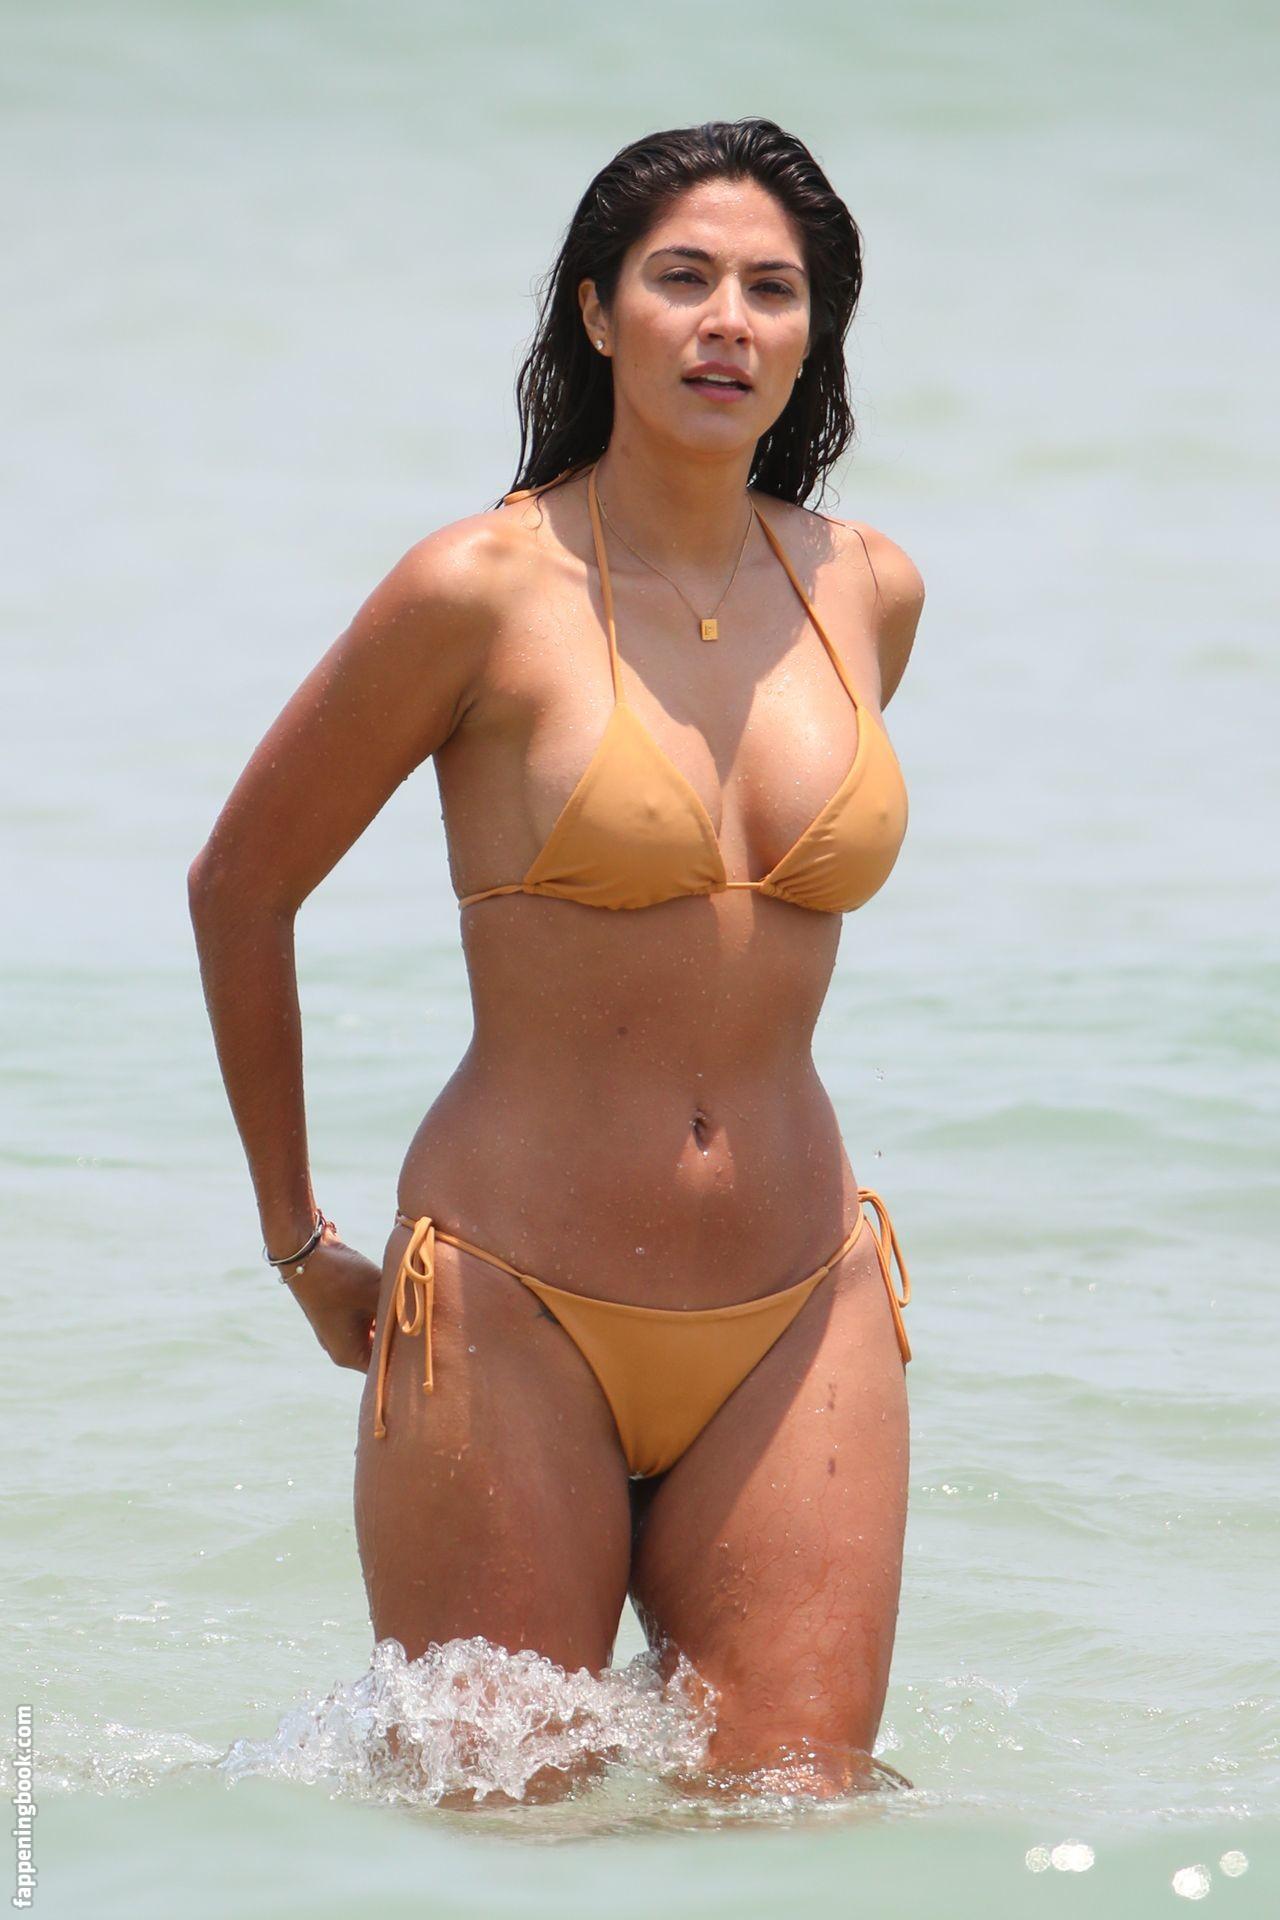 DEMI ROSE MAWBY in Bikini at a Photoshoot in Junle in bali